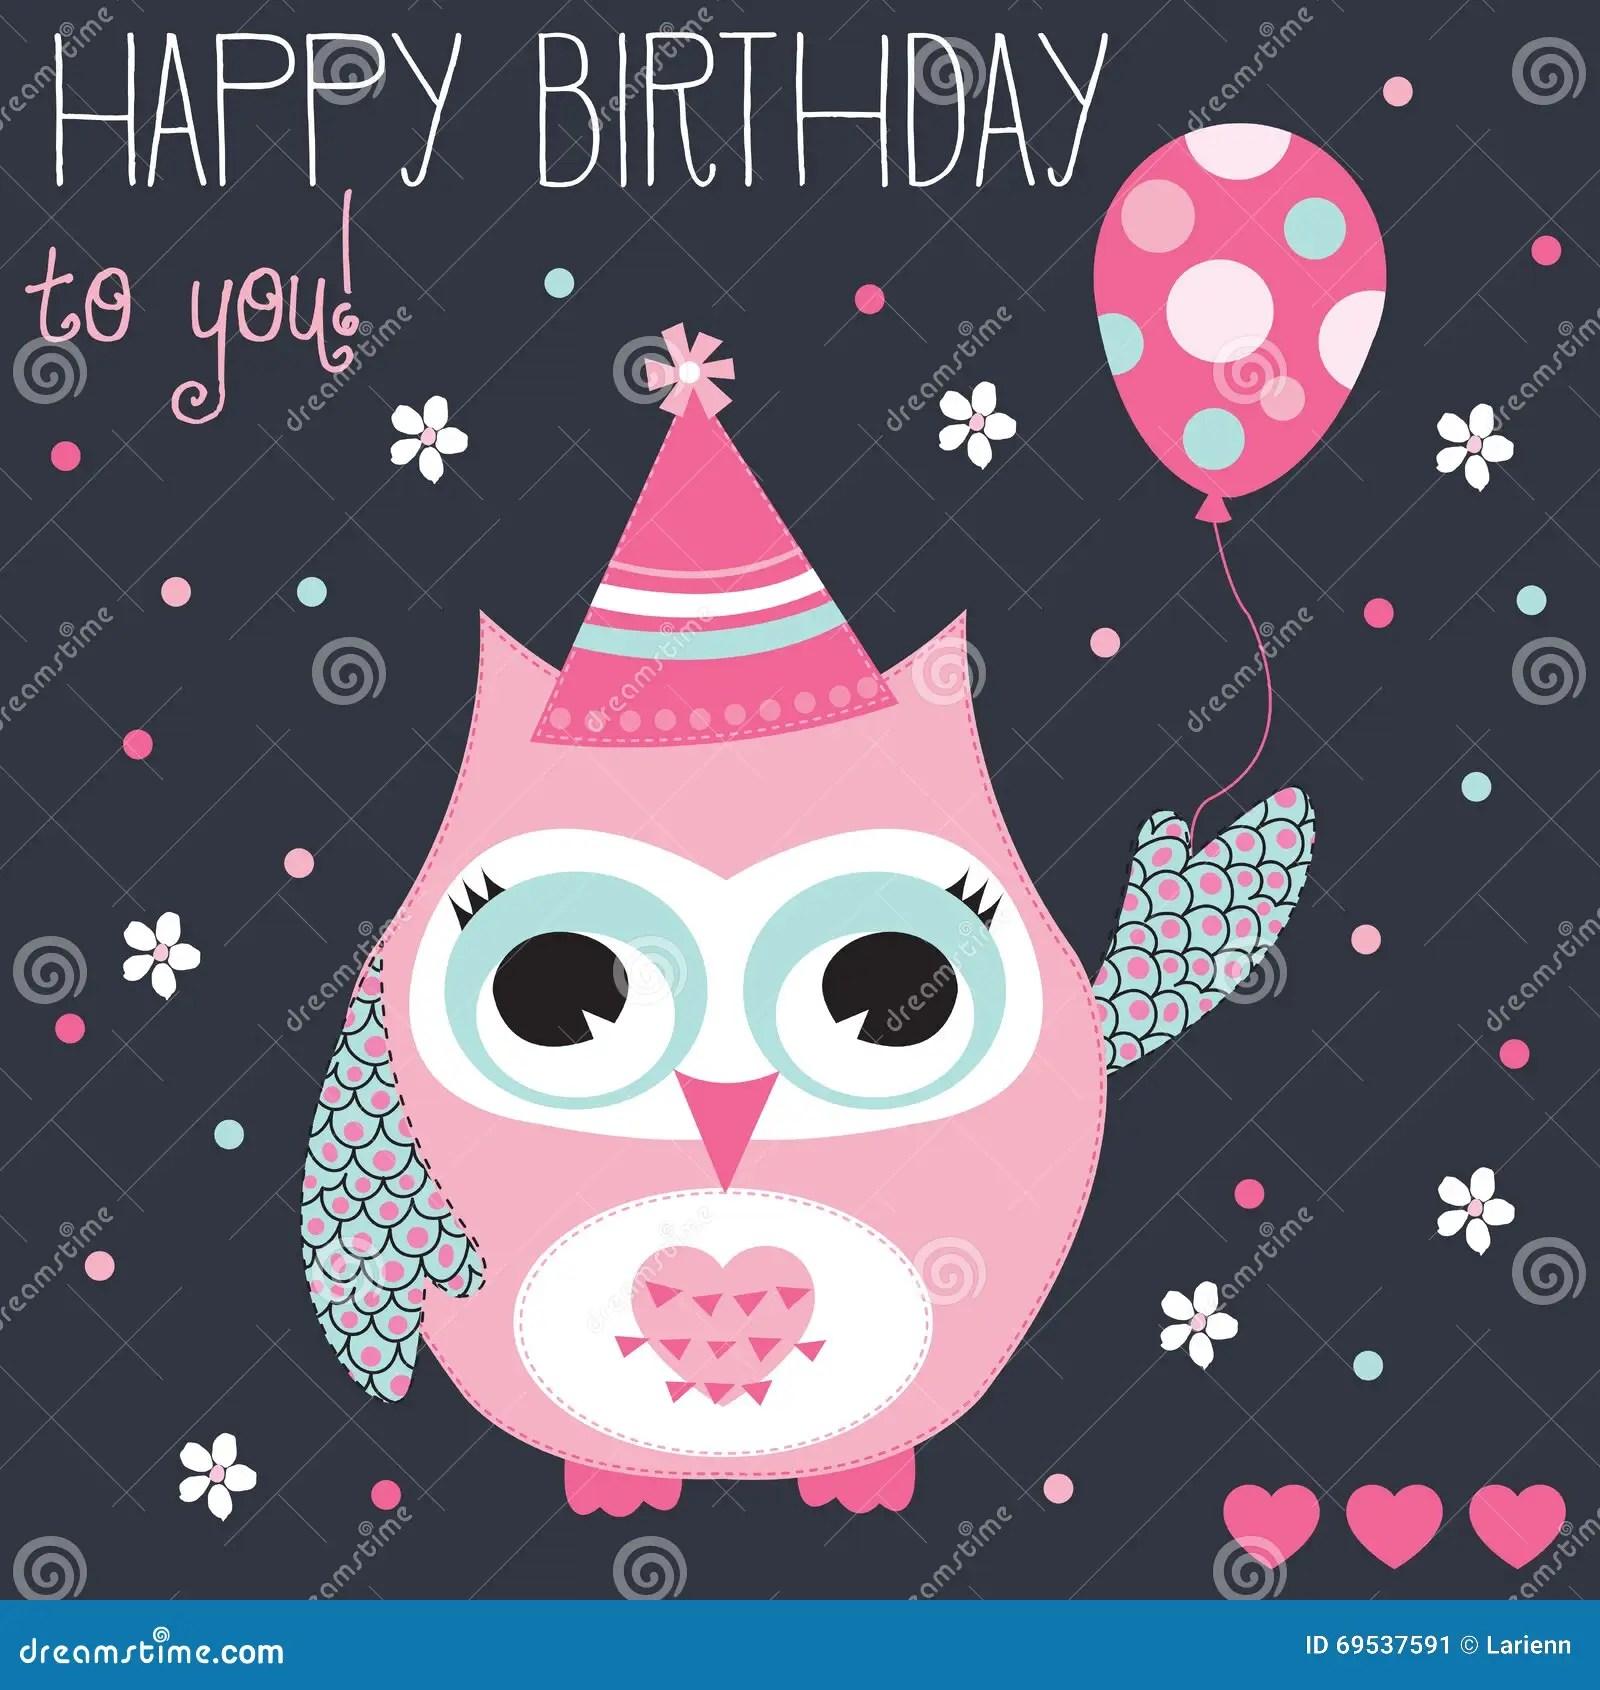 Happy Birthday Owl Vector Illustration Stock Vector Illustration Of Card Fashion 69537591